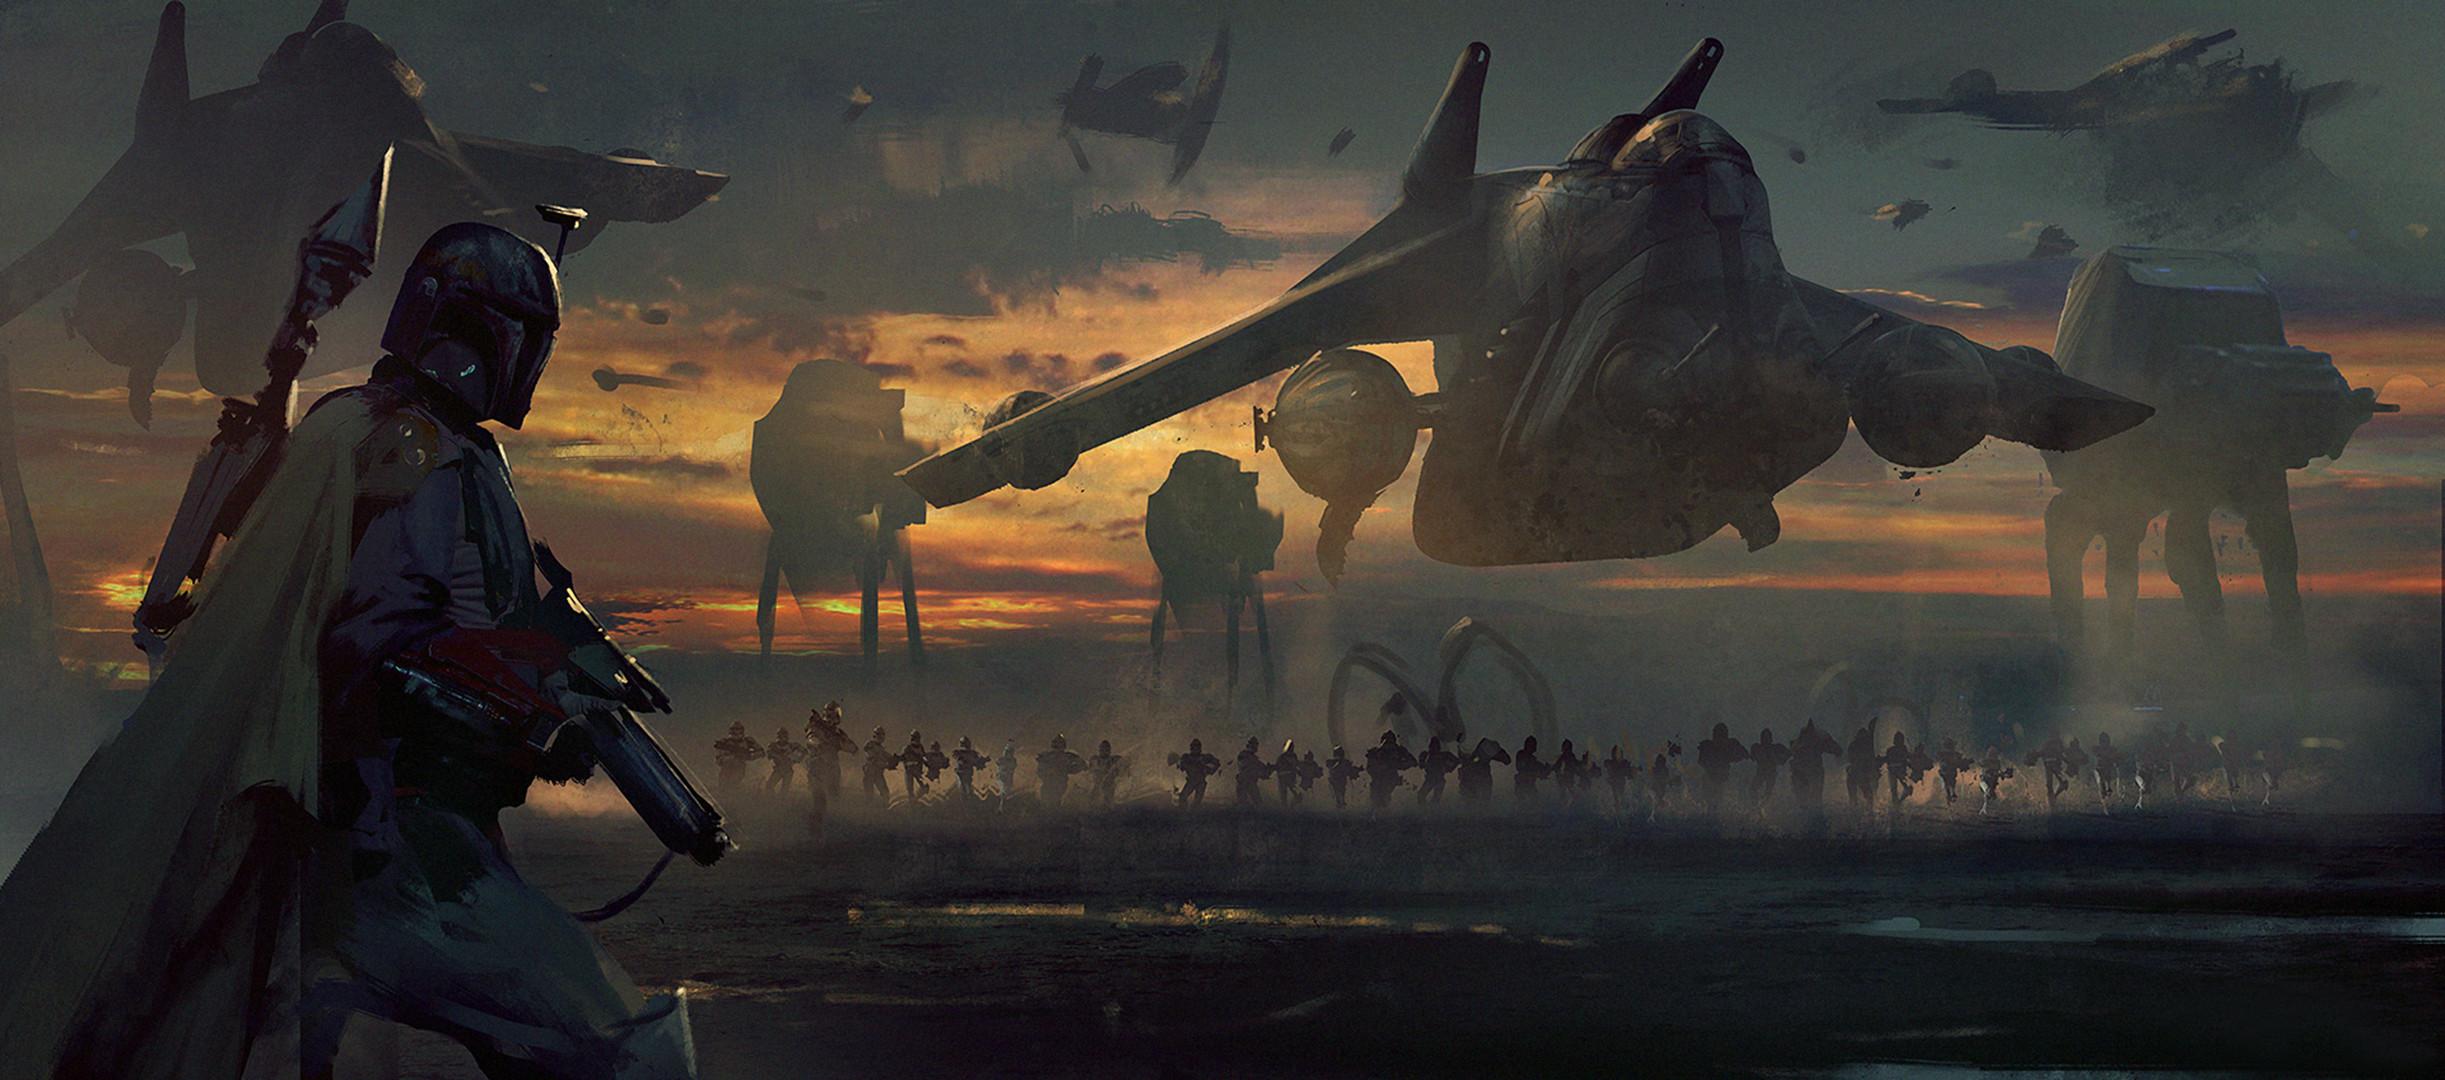 5i81m1m Star Wars Imperial Guard Wallpaper 2445x1080 Download Hd Wallpaper Wallpapertip